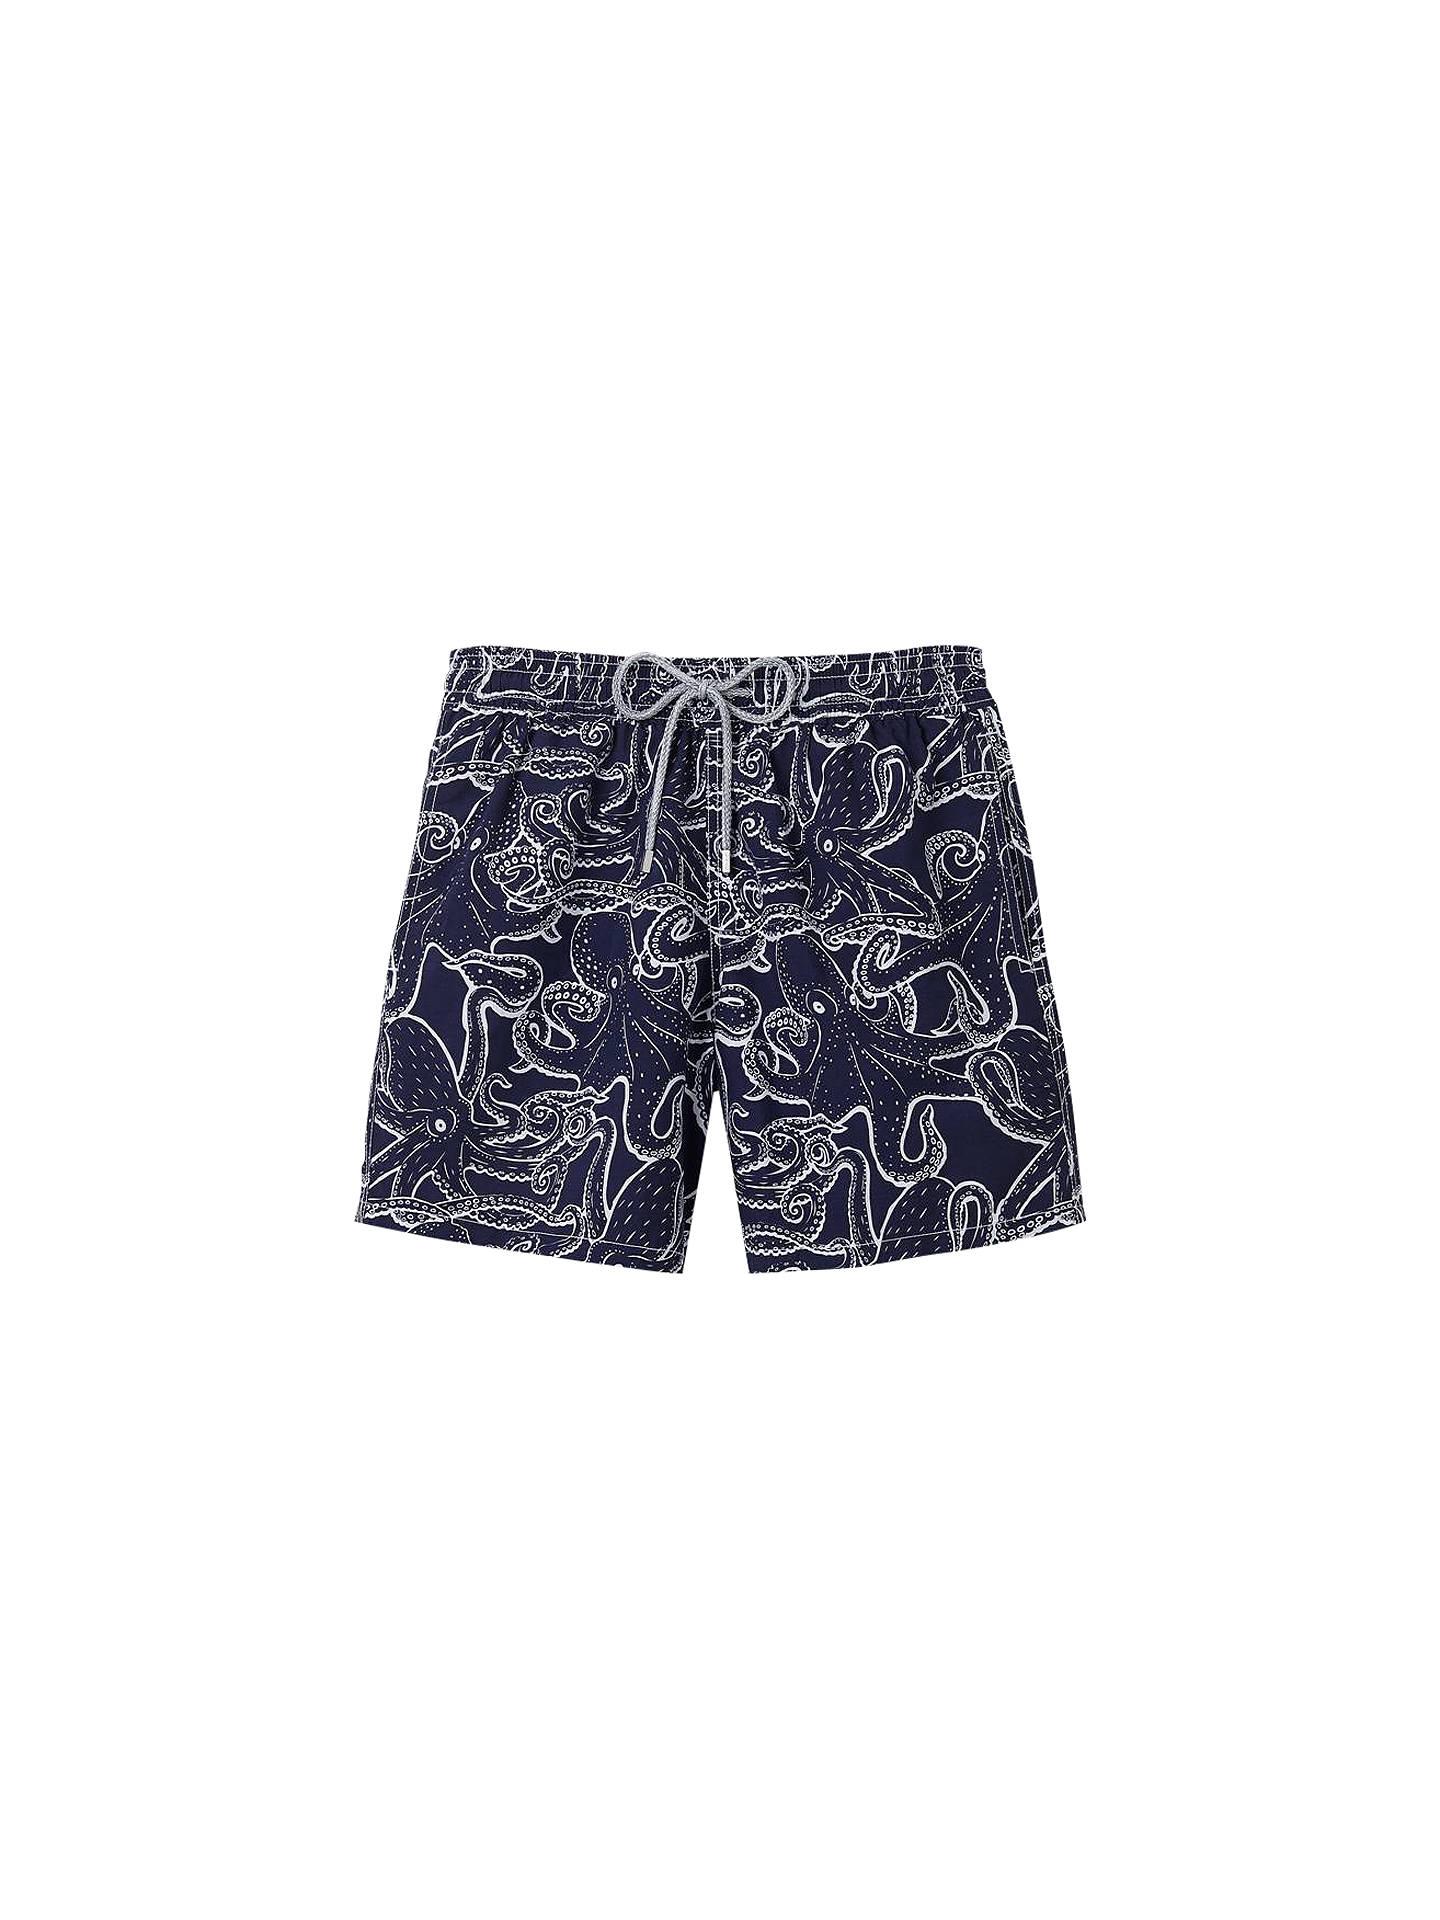 d4db59c1d Buy Vilebrequin Octopus Print Swim Shorts, Navy, M Online at johnlewis.com